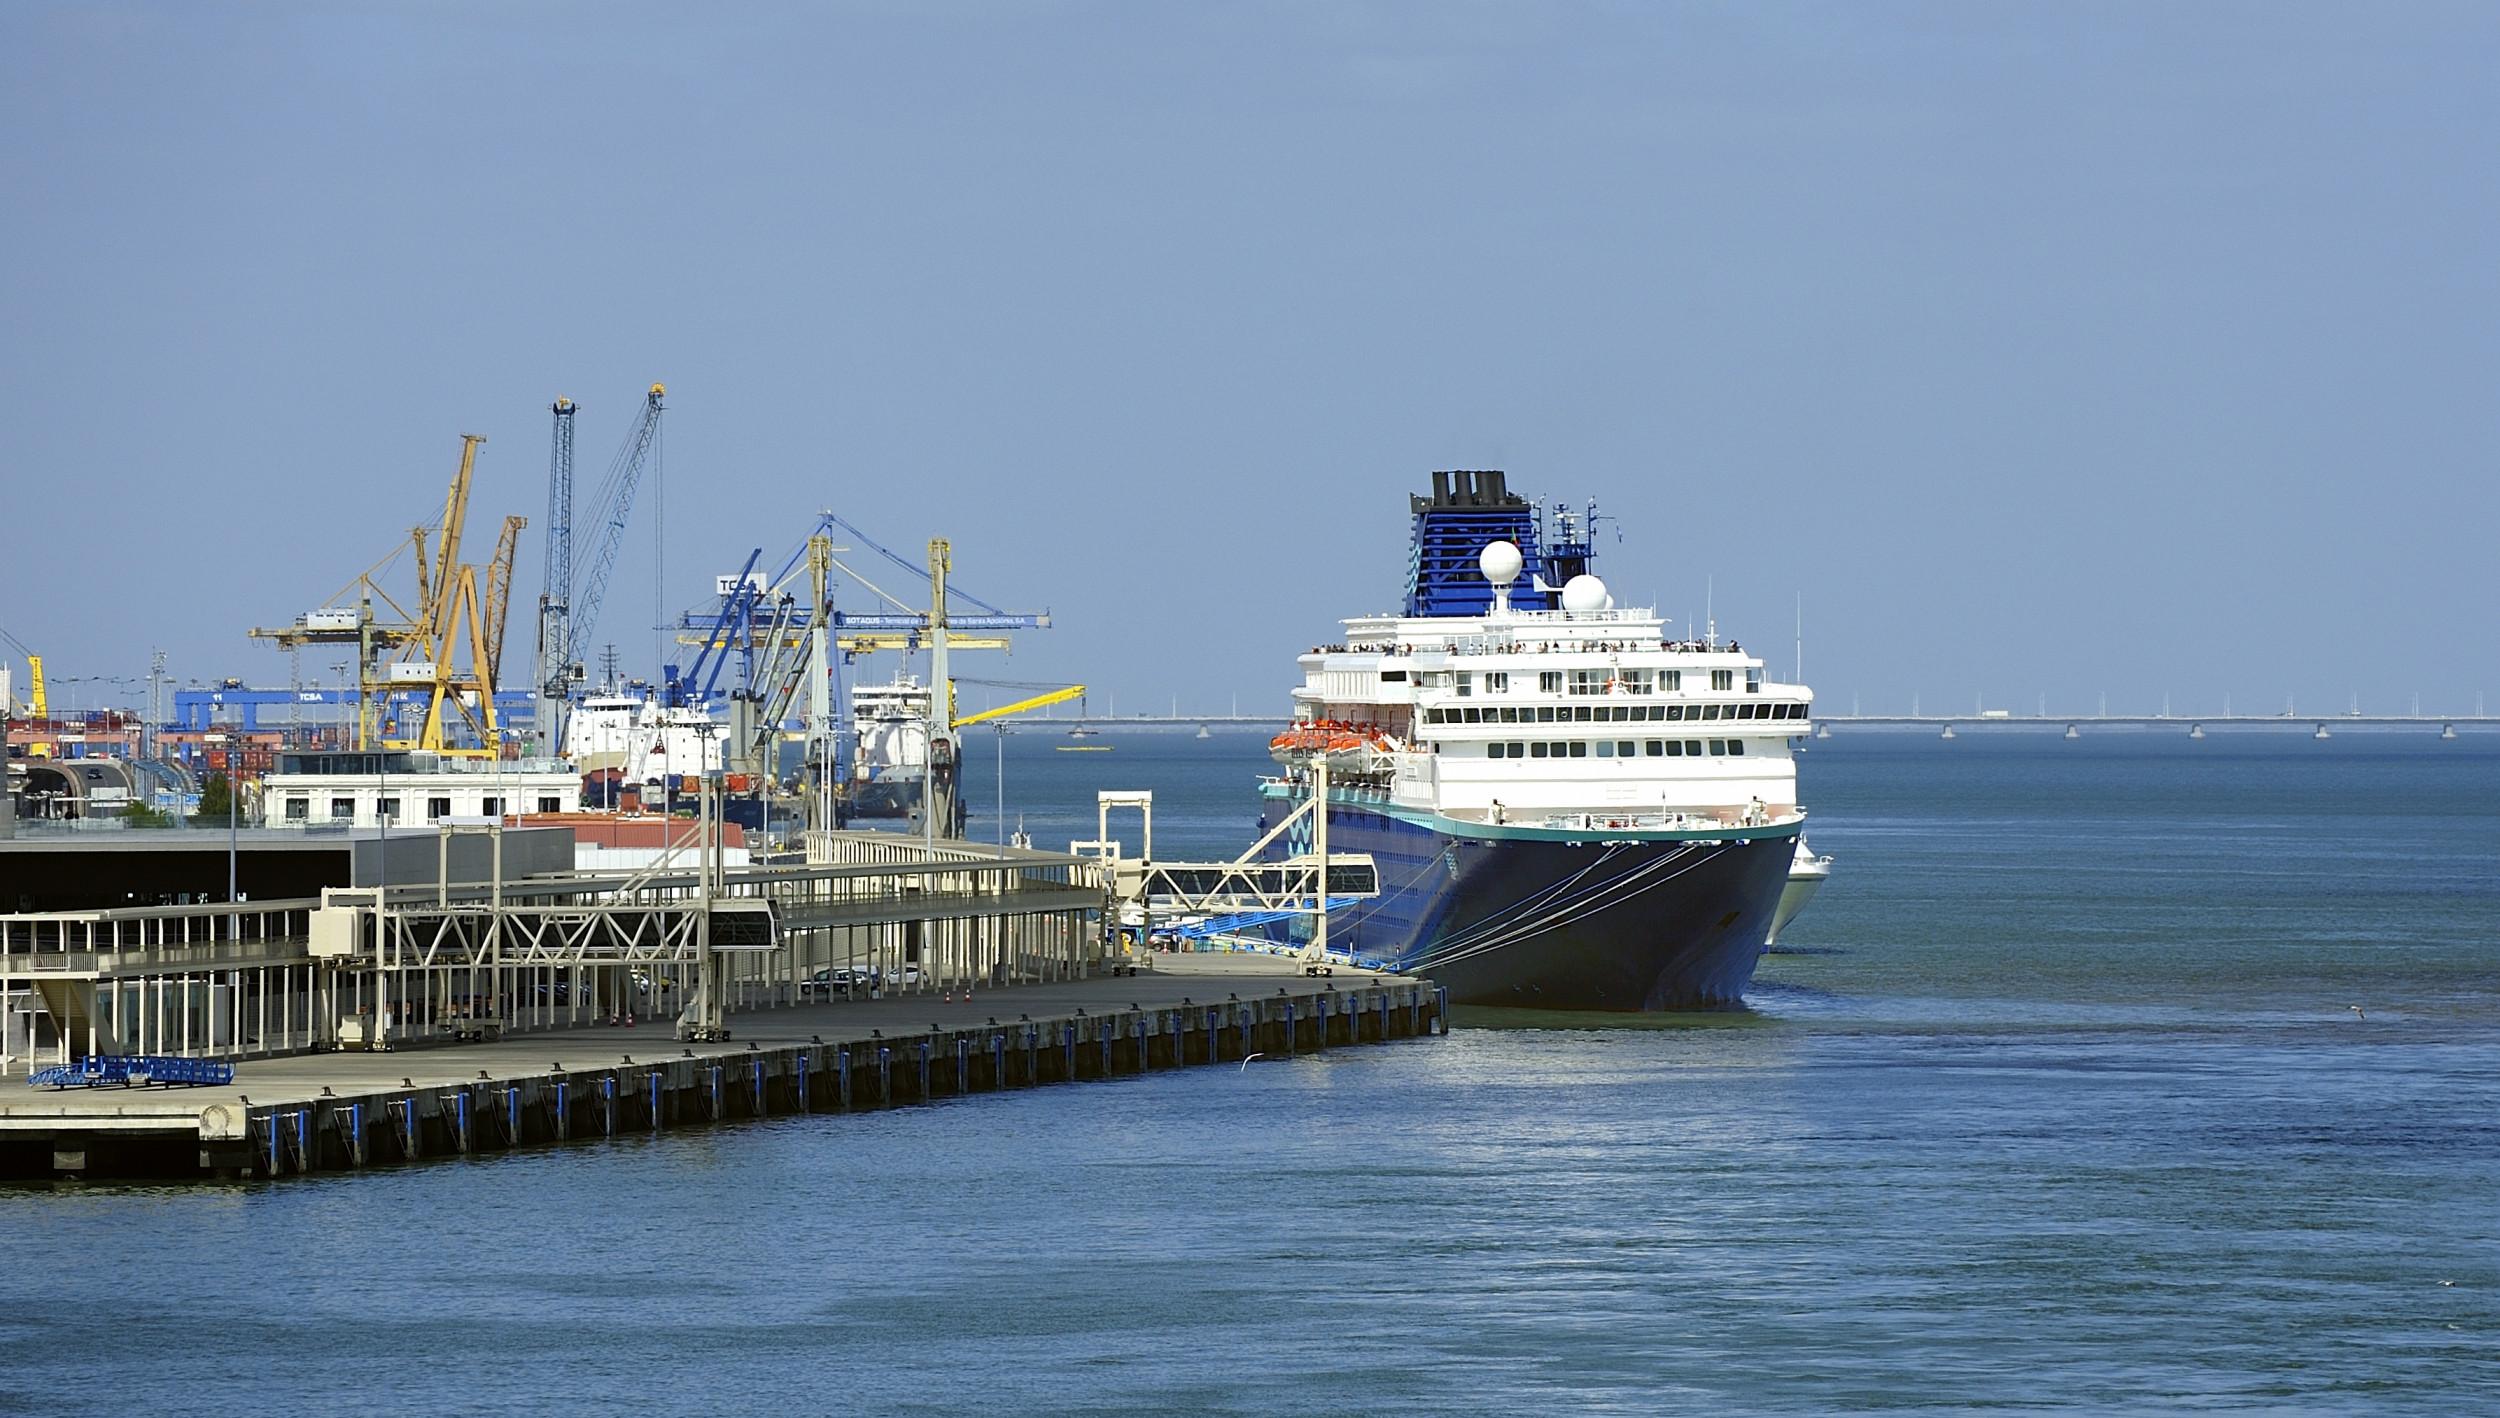 Oakland City Council President Proposes Using Cruise Ship ...